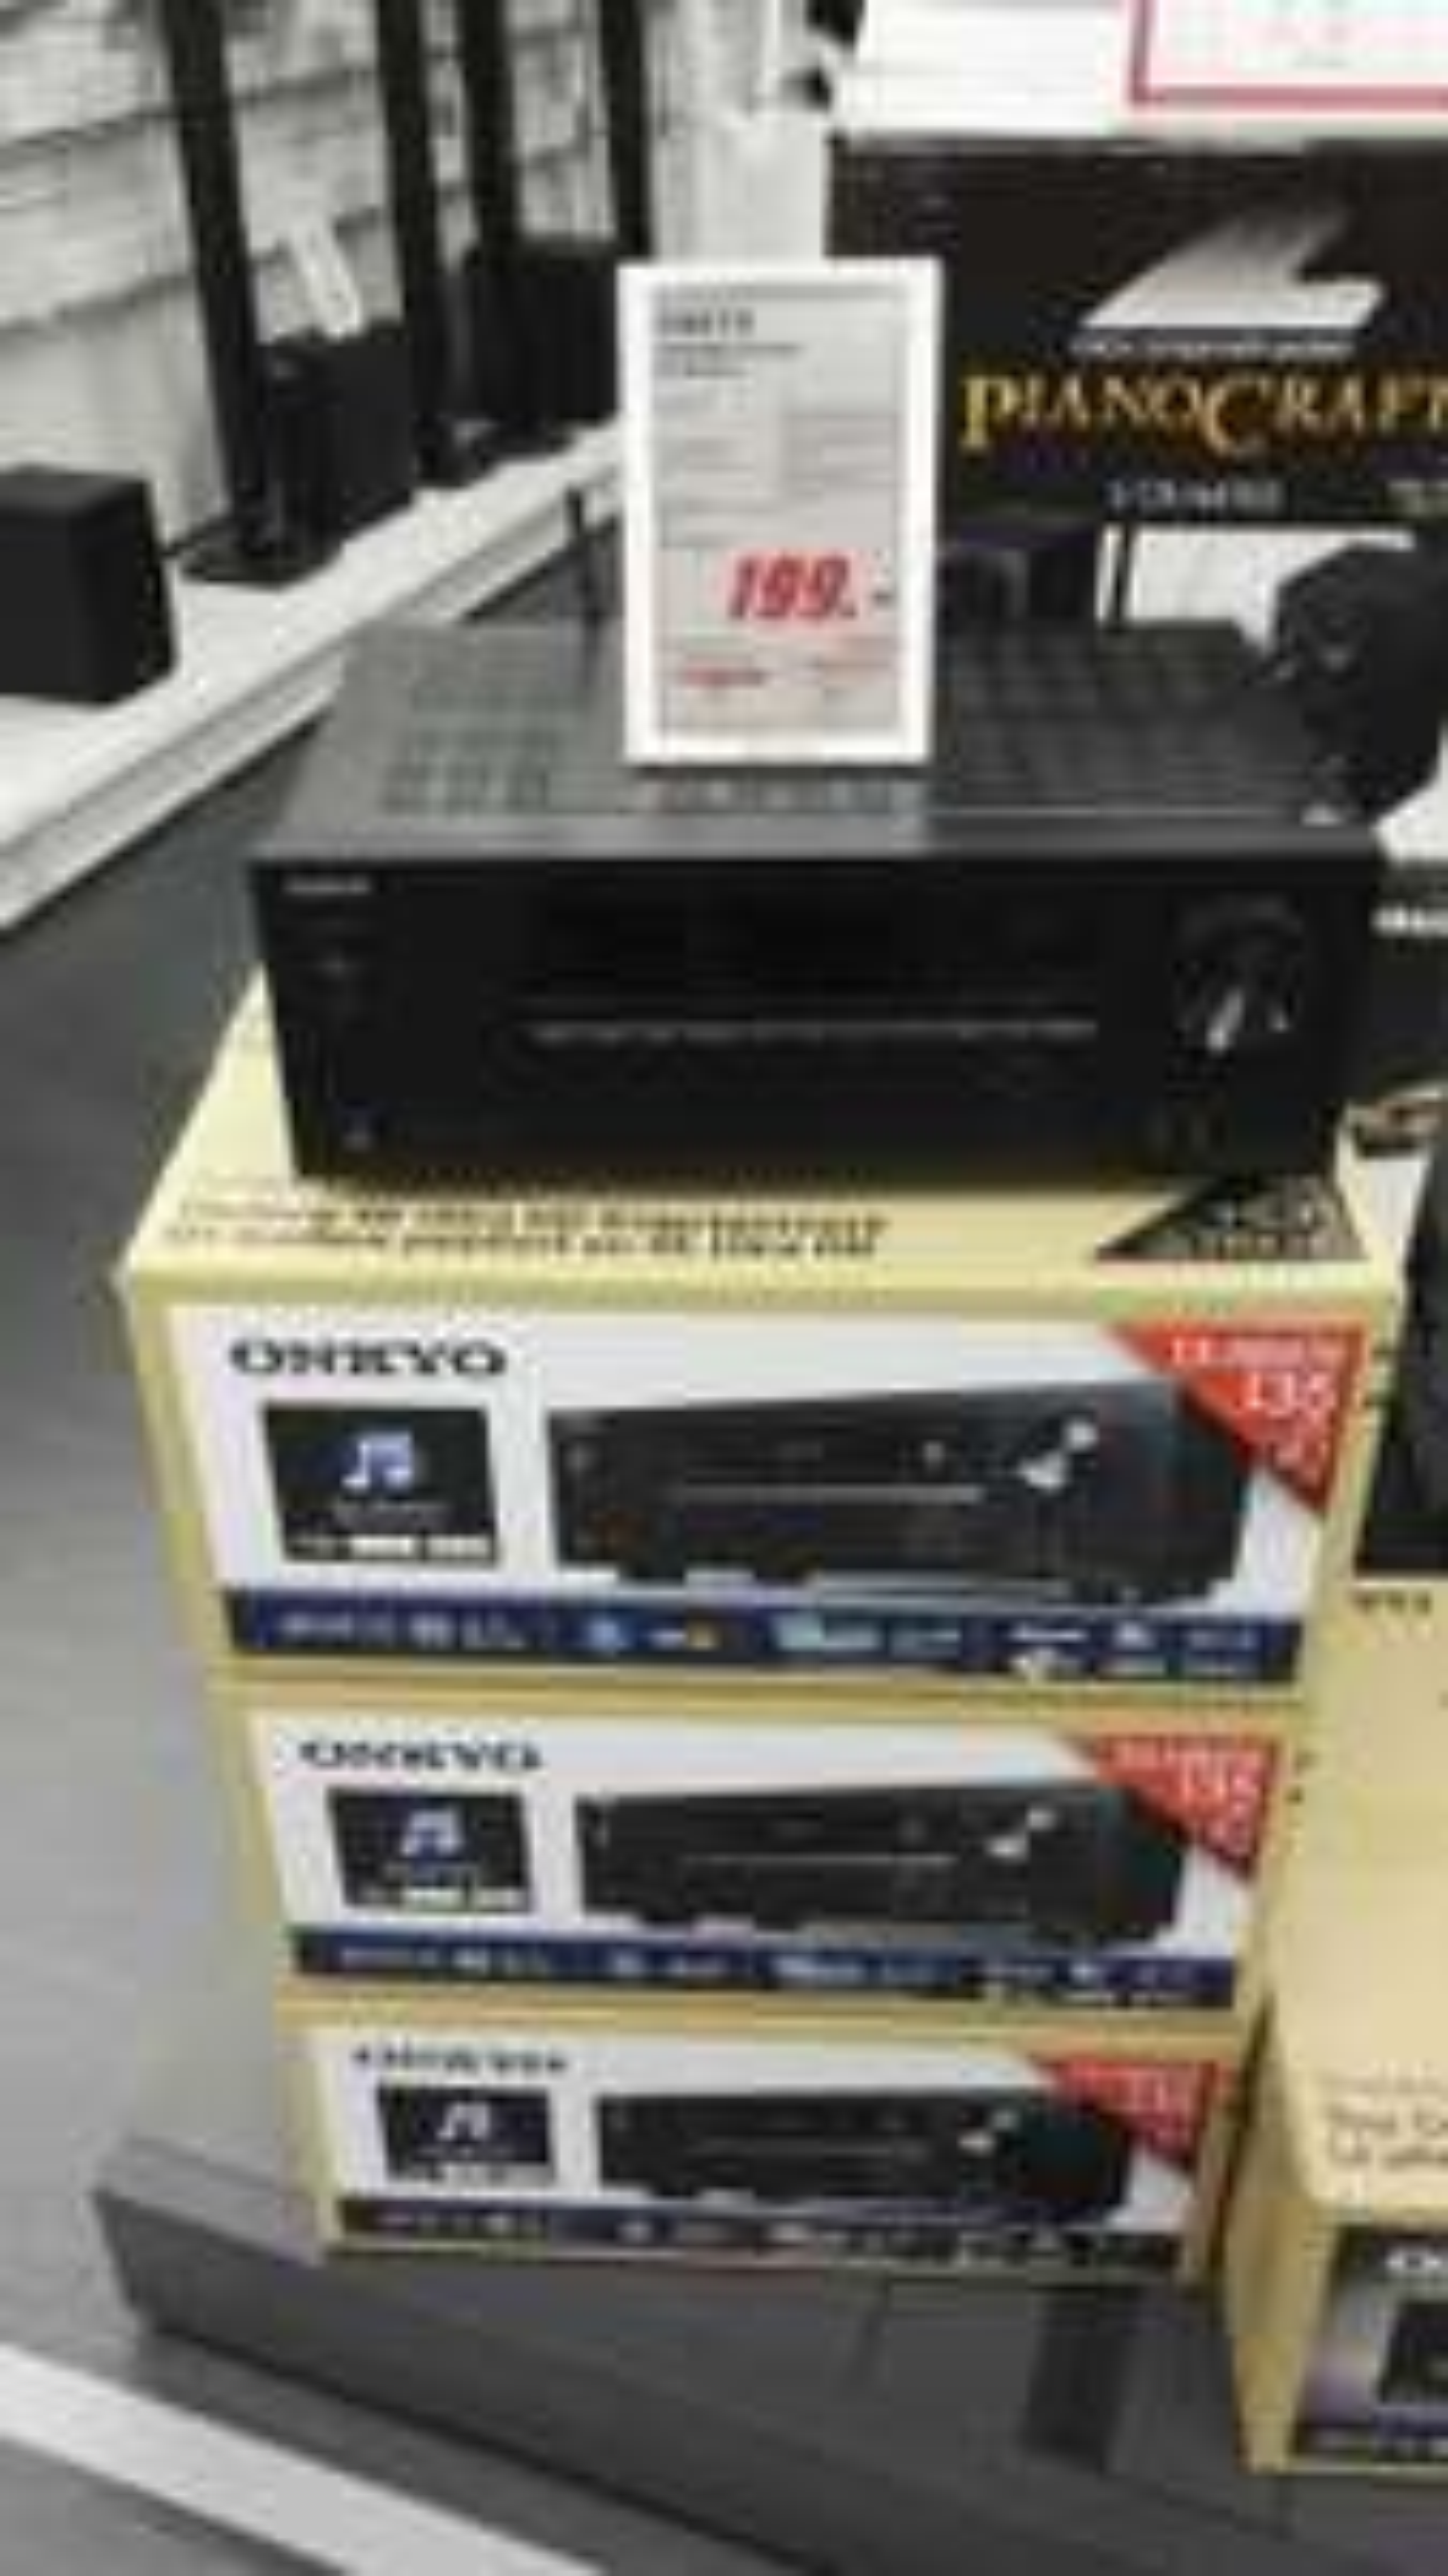 Onkyo TX-NR474 AV Receiver AVR 5.1 schwarz (lokal Ludwigsburg) [MediaMarkt]